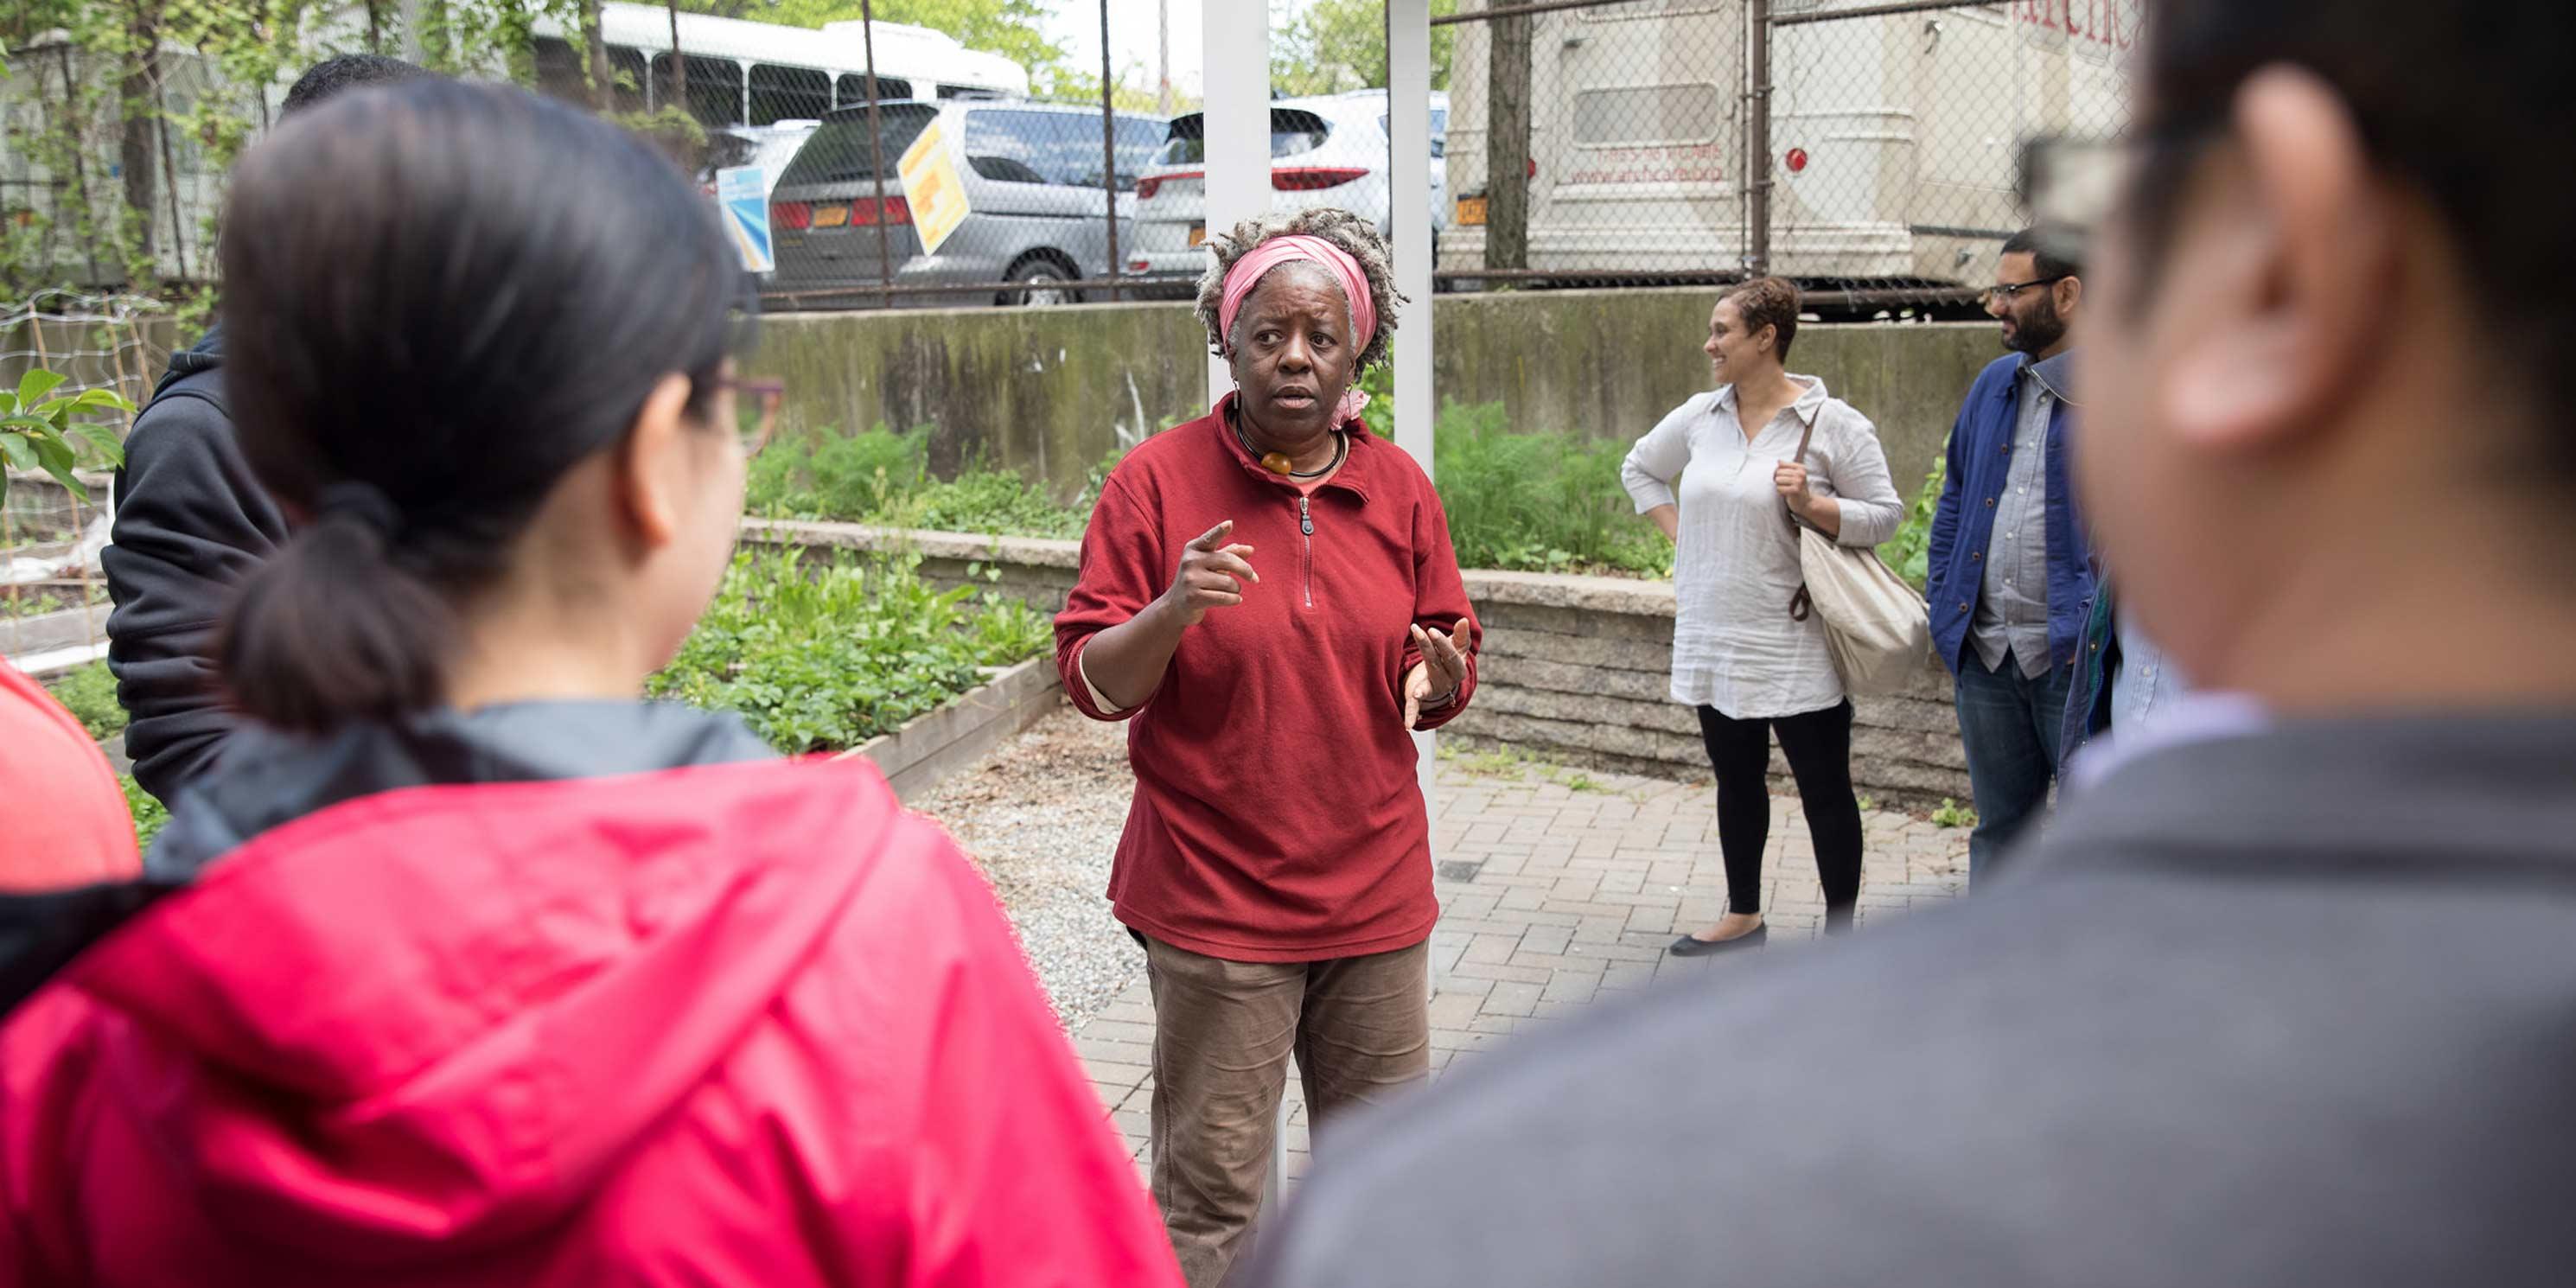 leader speaks during a Jane's Walk at a community garden